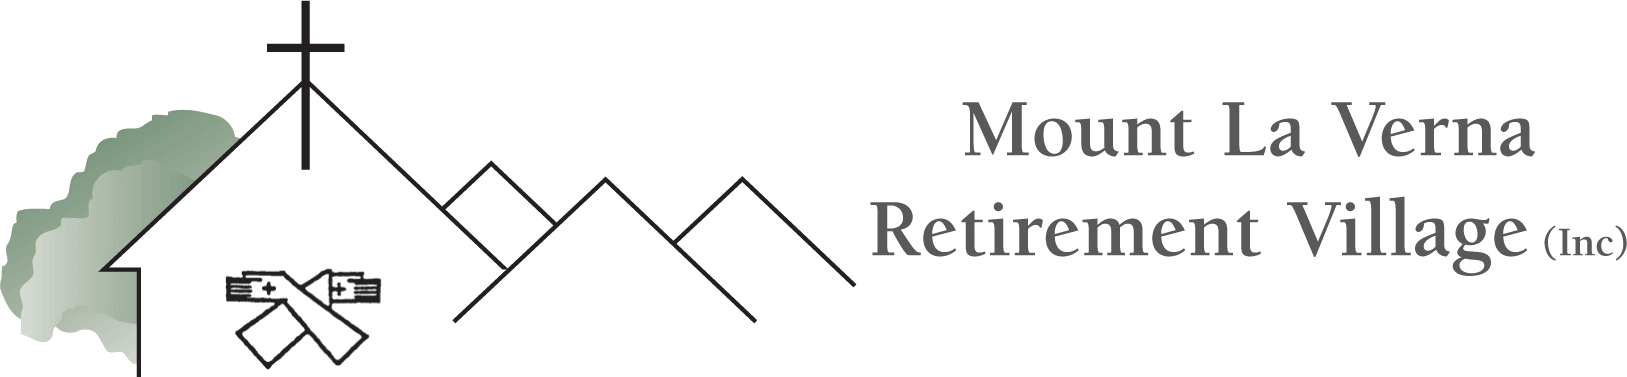 Mount La Verna Retirement Village